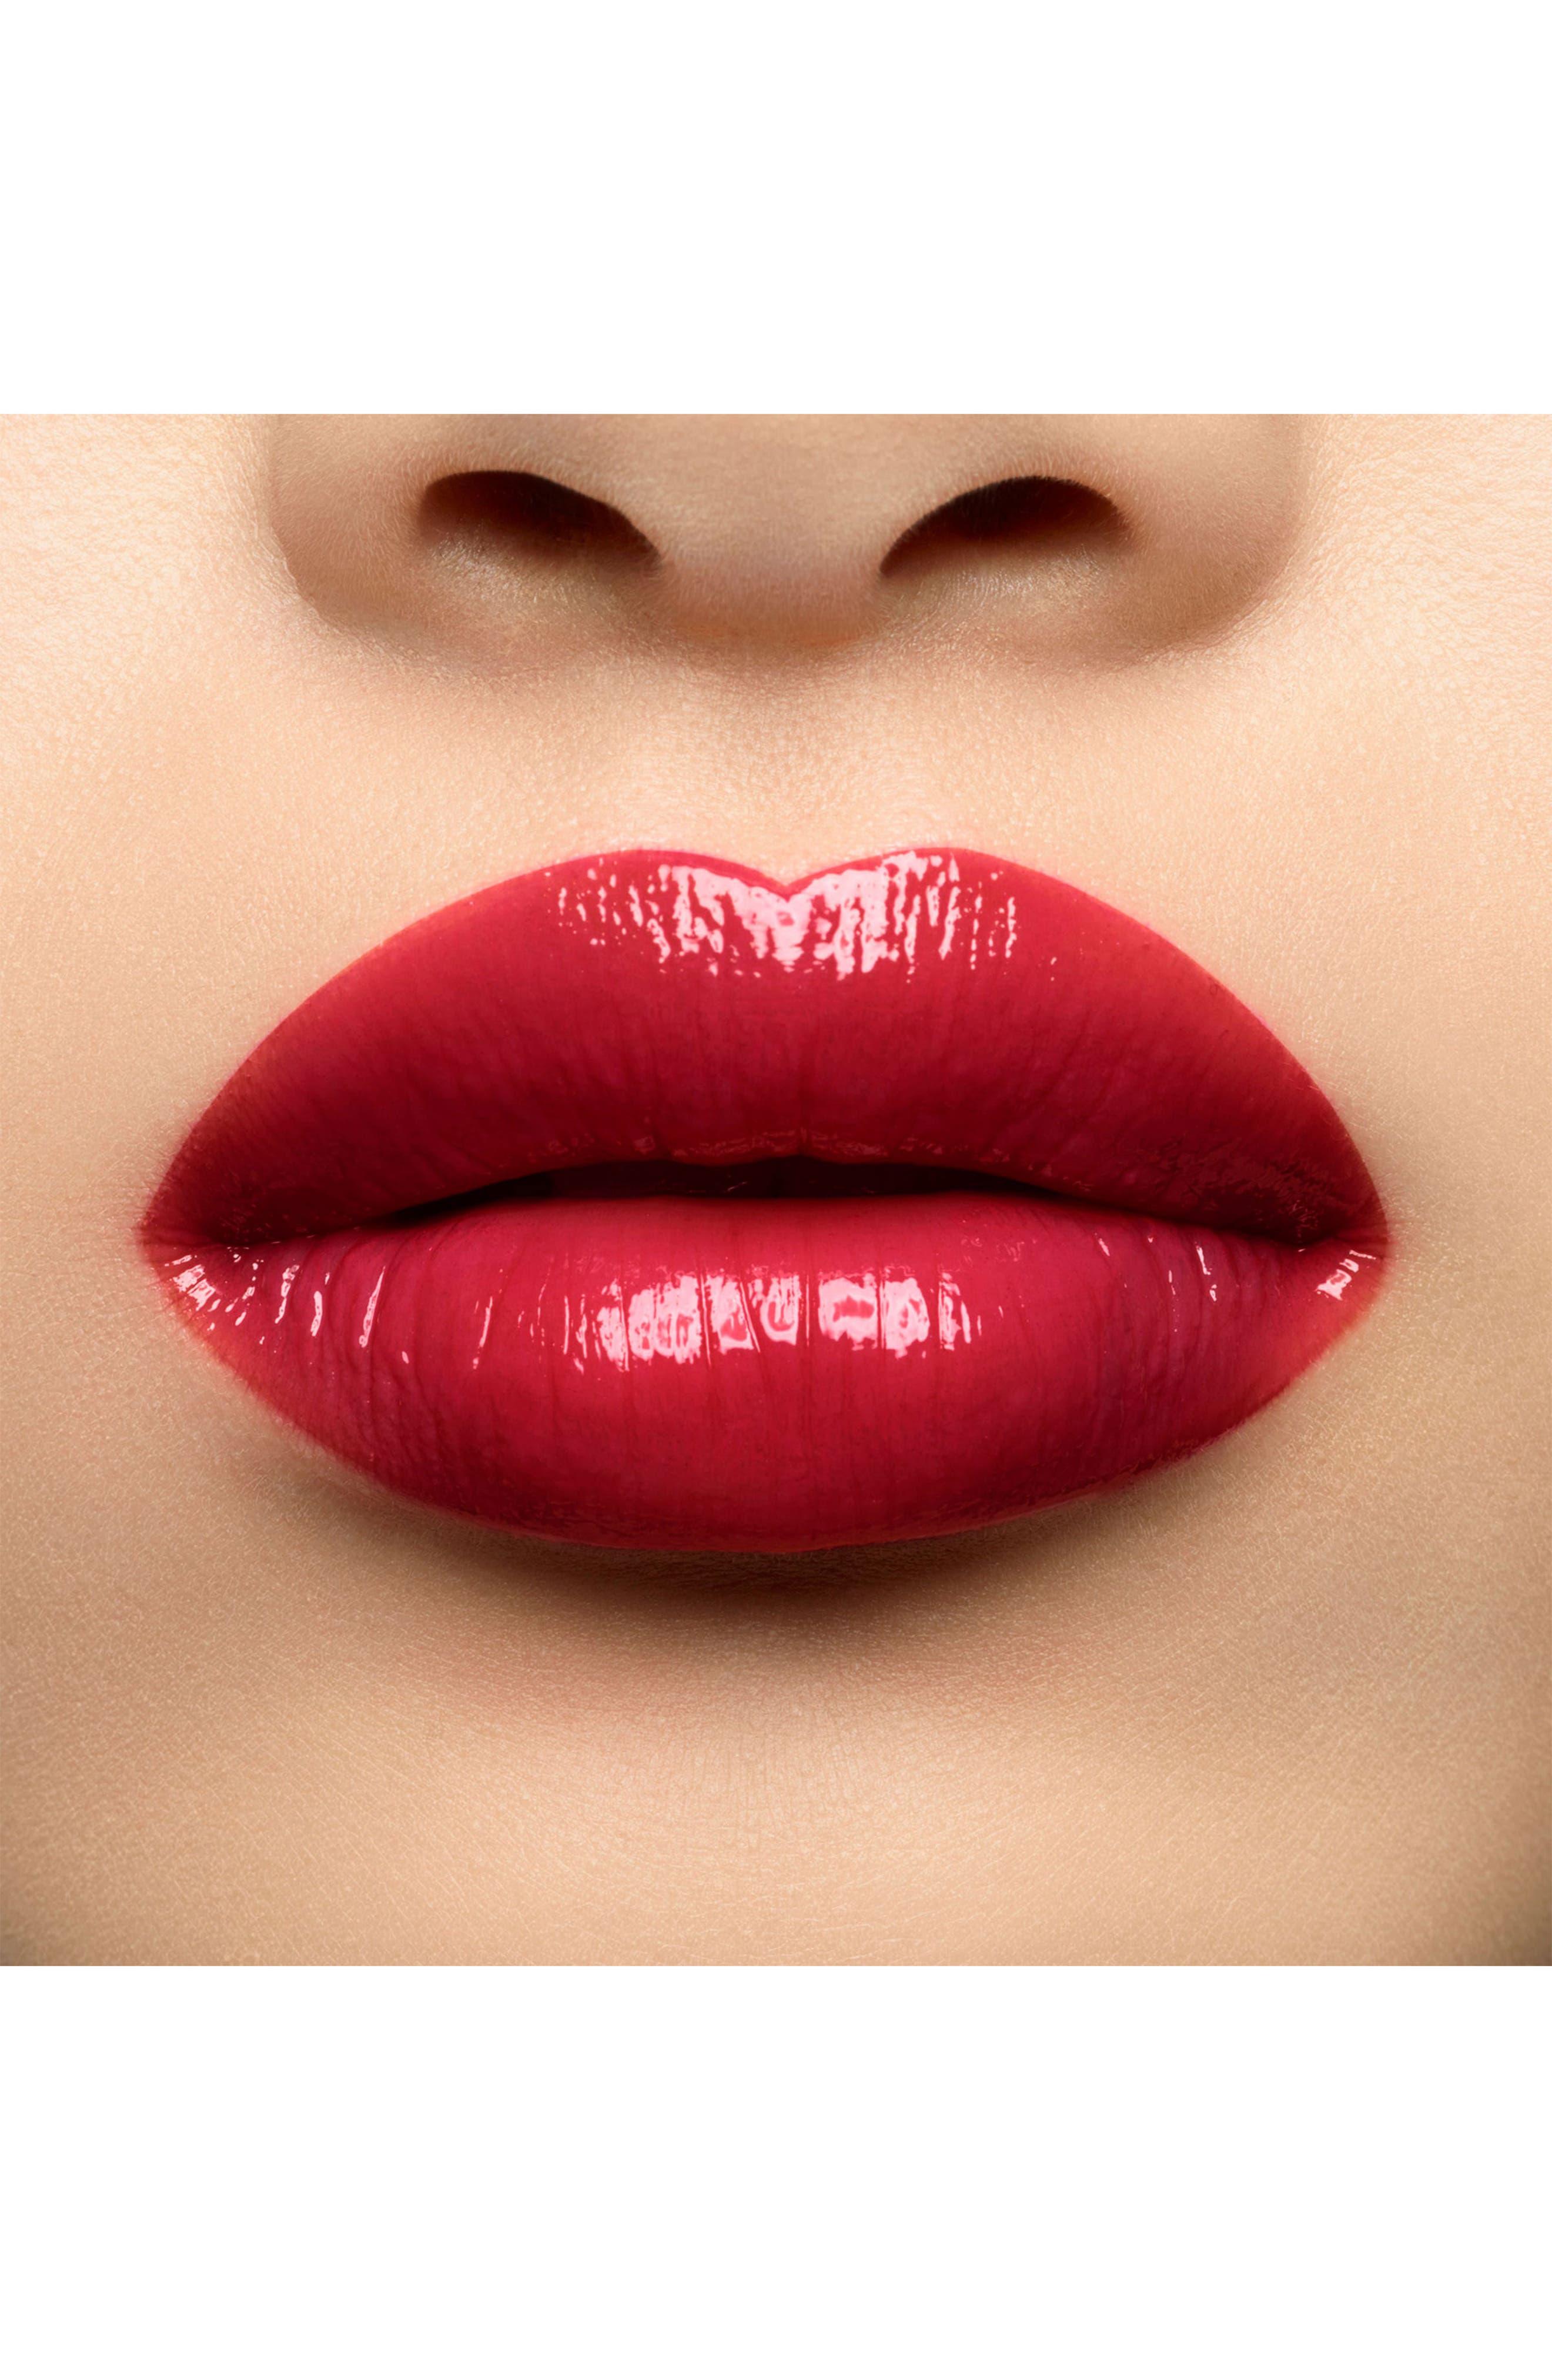 Volupté Plump-in-Color Plumping Lip Balm,                             Alternate thumbnail 3, color,                             06 LUNATIC RED